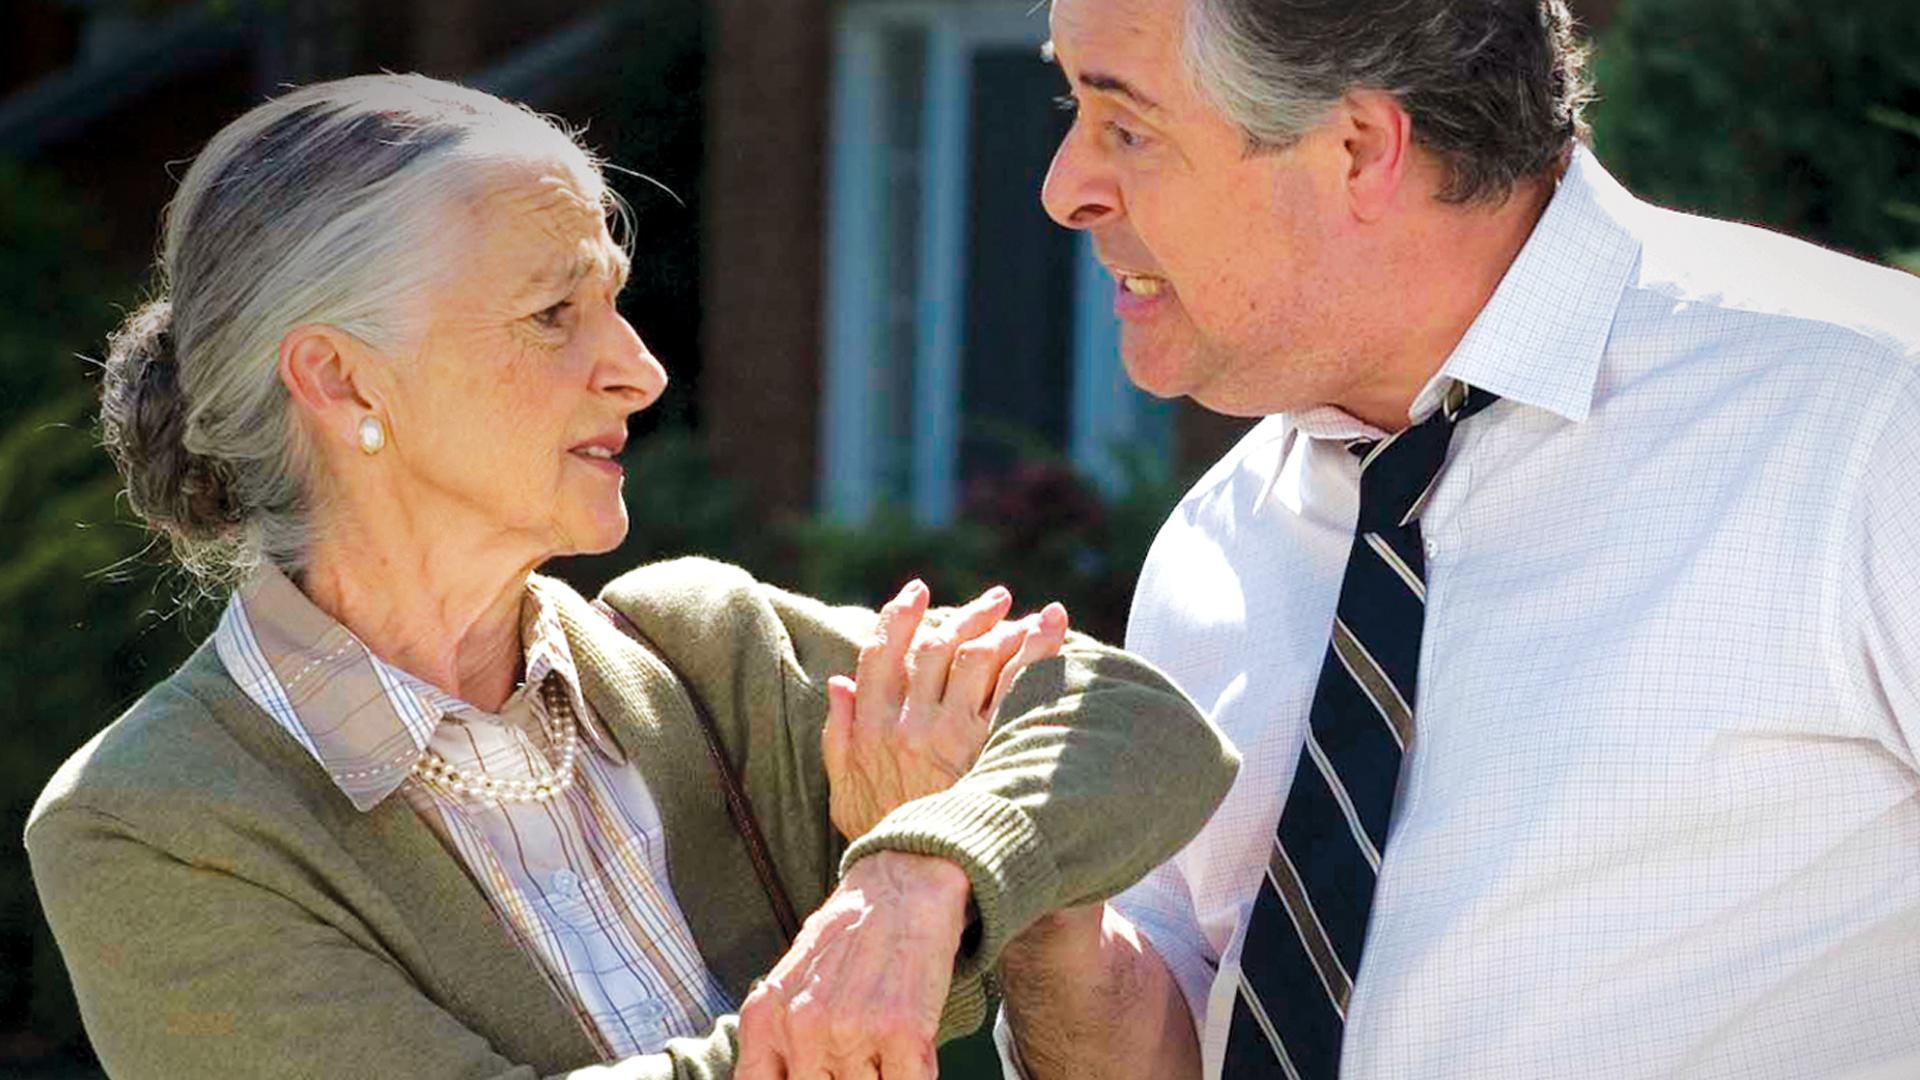 Elder Abuse Campaign By Acart Elder Abuse Awareness